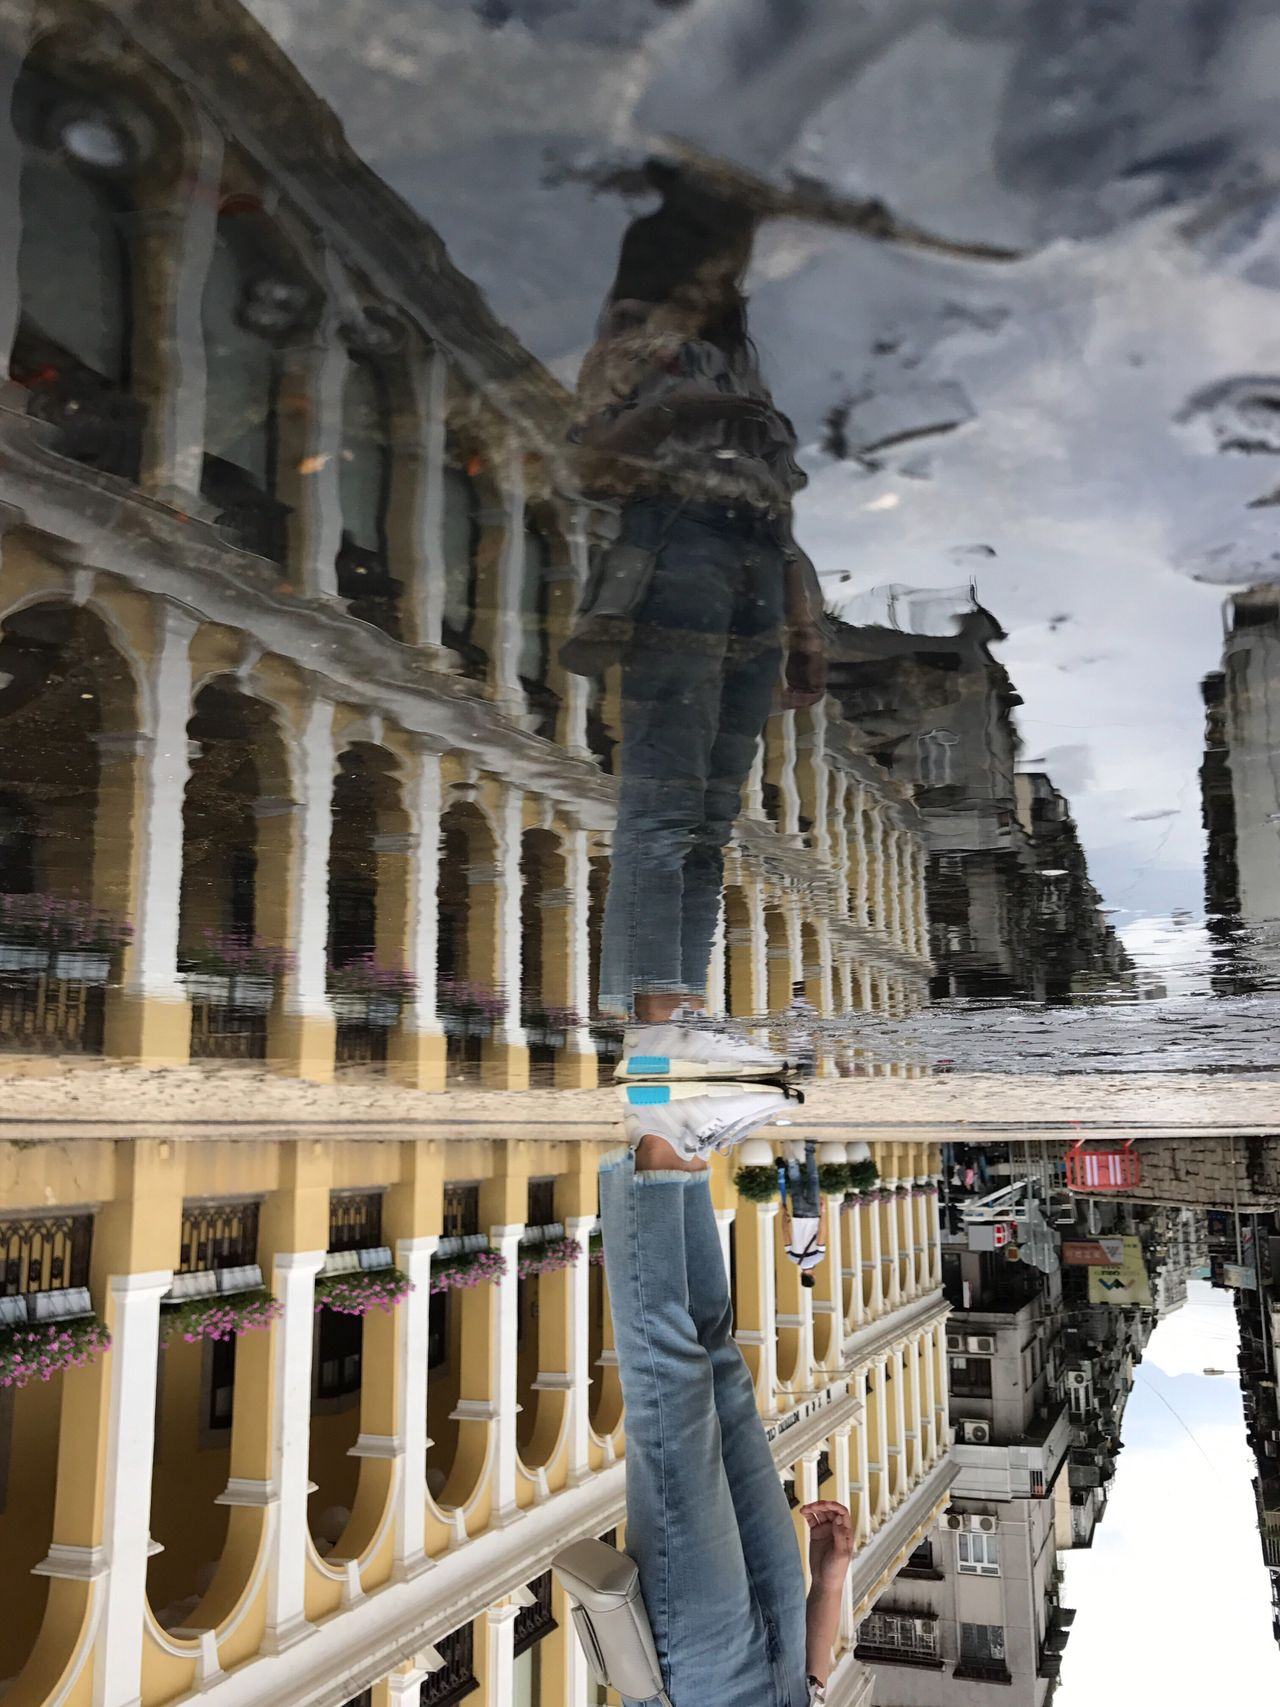 IPhone IPhoneography IPhone7Plus ShotOnIphone Shotoniphone7plus Iphoneonly Macau The Great Outdoors - 2017 EyeEm Awards The Street Photographer - 2017 EyeEm Awards The Portraitist - 2017 EyeEm Awards